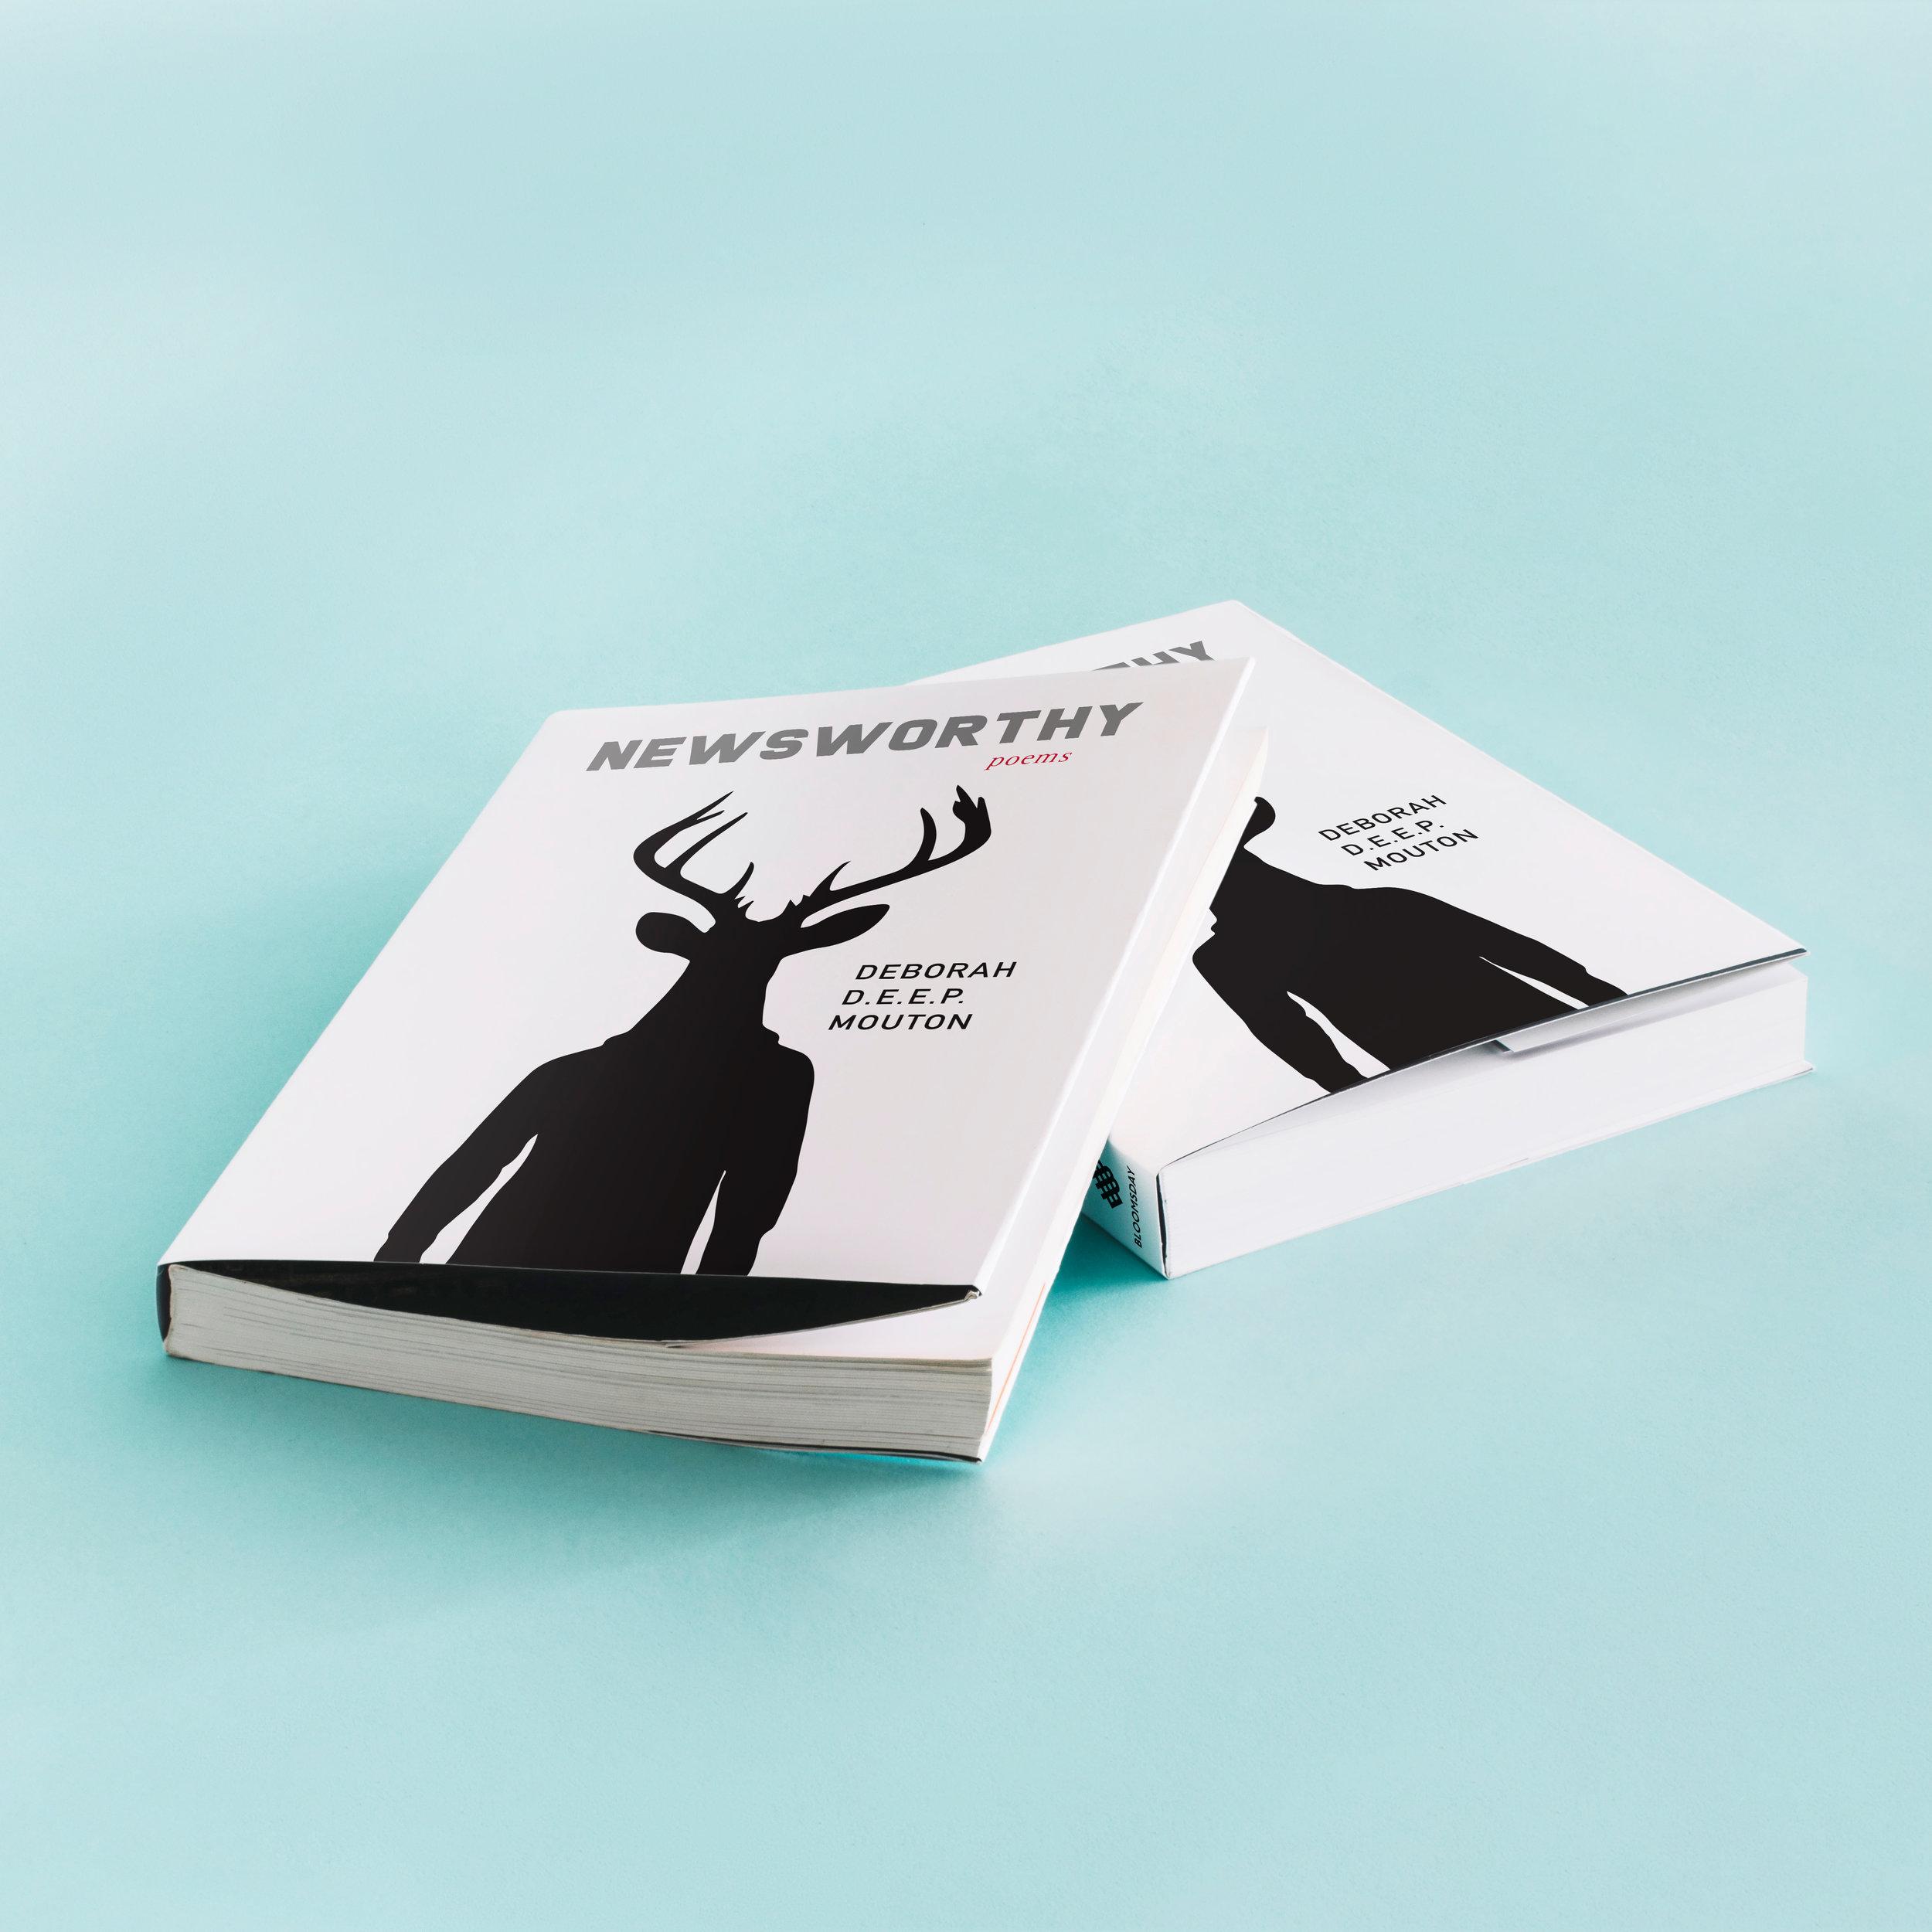 Newsworthy-Mockup-Cover-French-Flaps.jpg